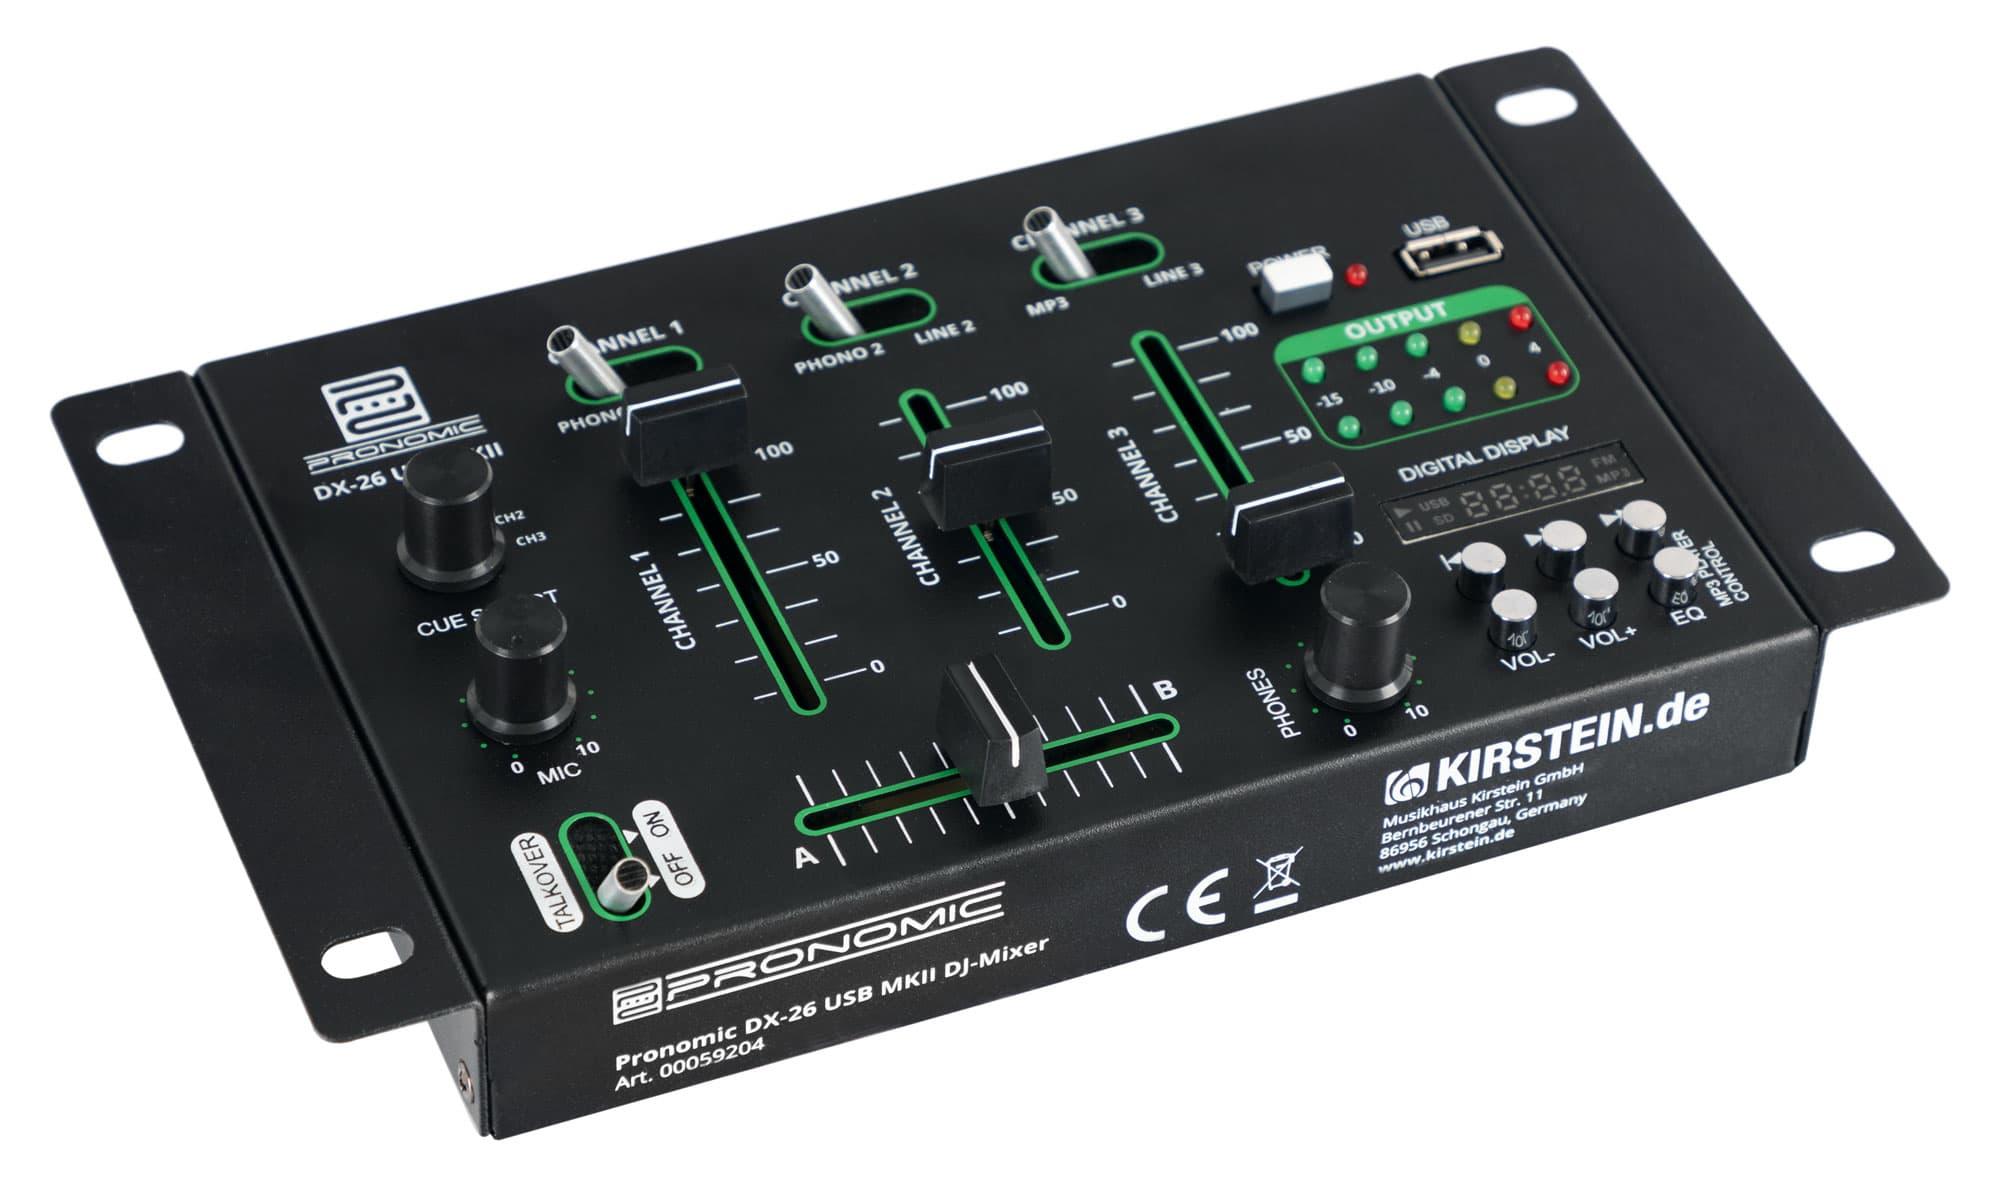 Djmixer - Pronomic DX 26 USB MKII DJ Mixer - Onlineshop Musikhaus Kirstein